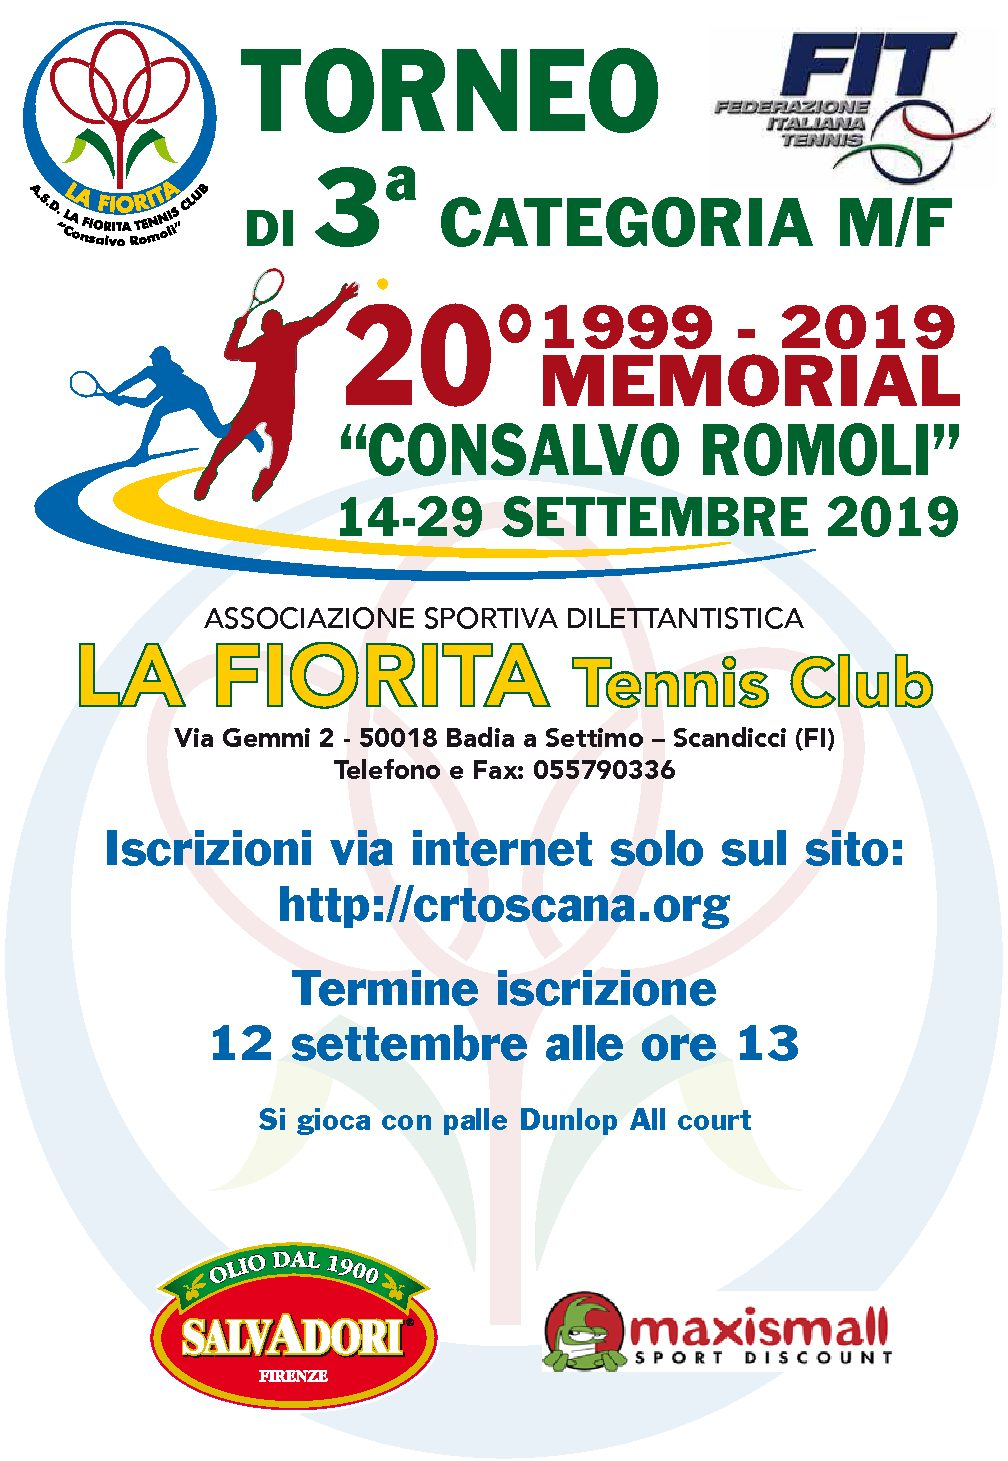 Torneo FIT 2 Consalvo Romoli, 20a edizione!